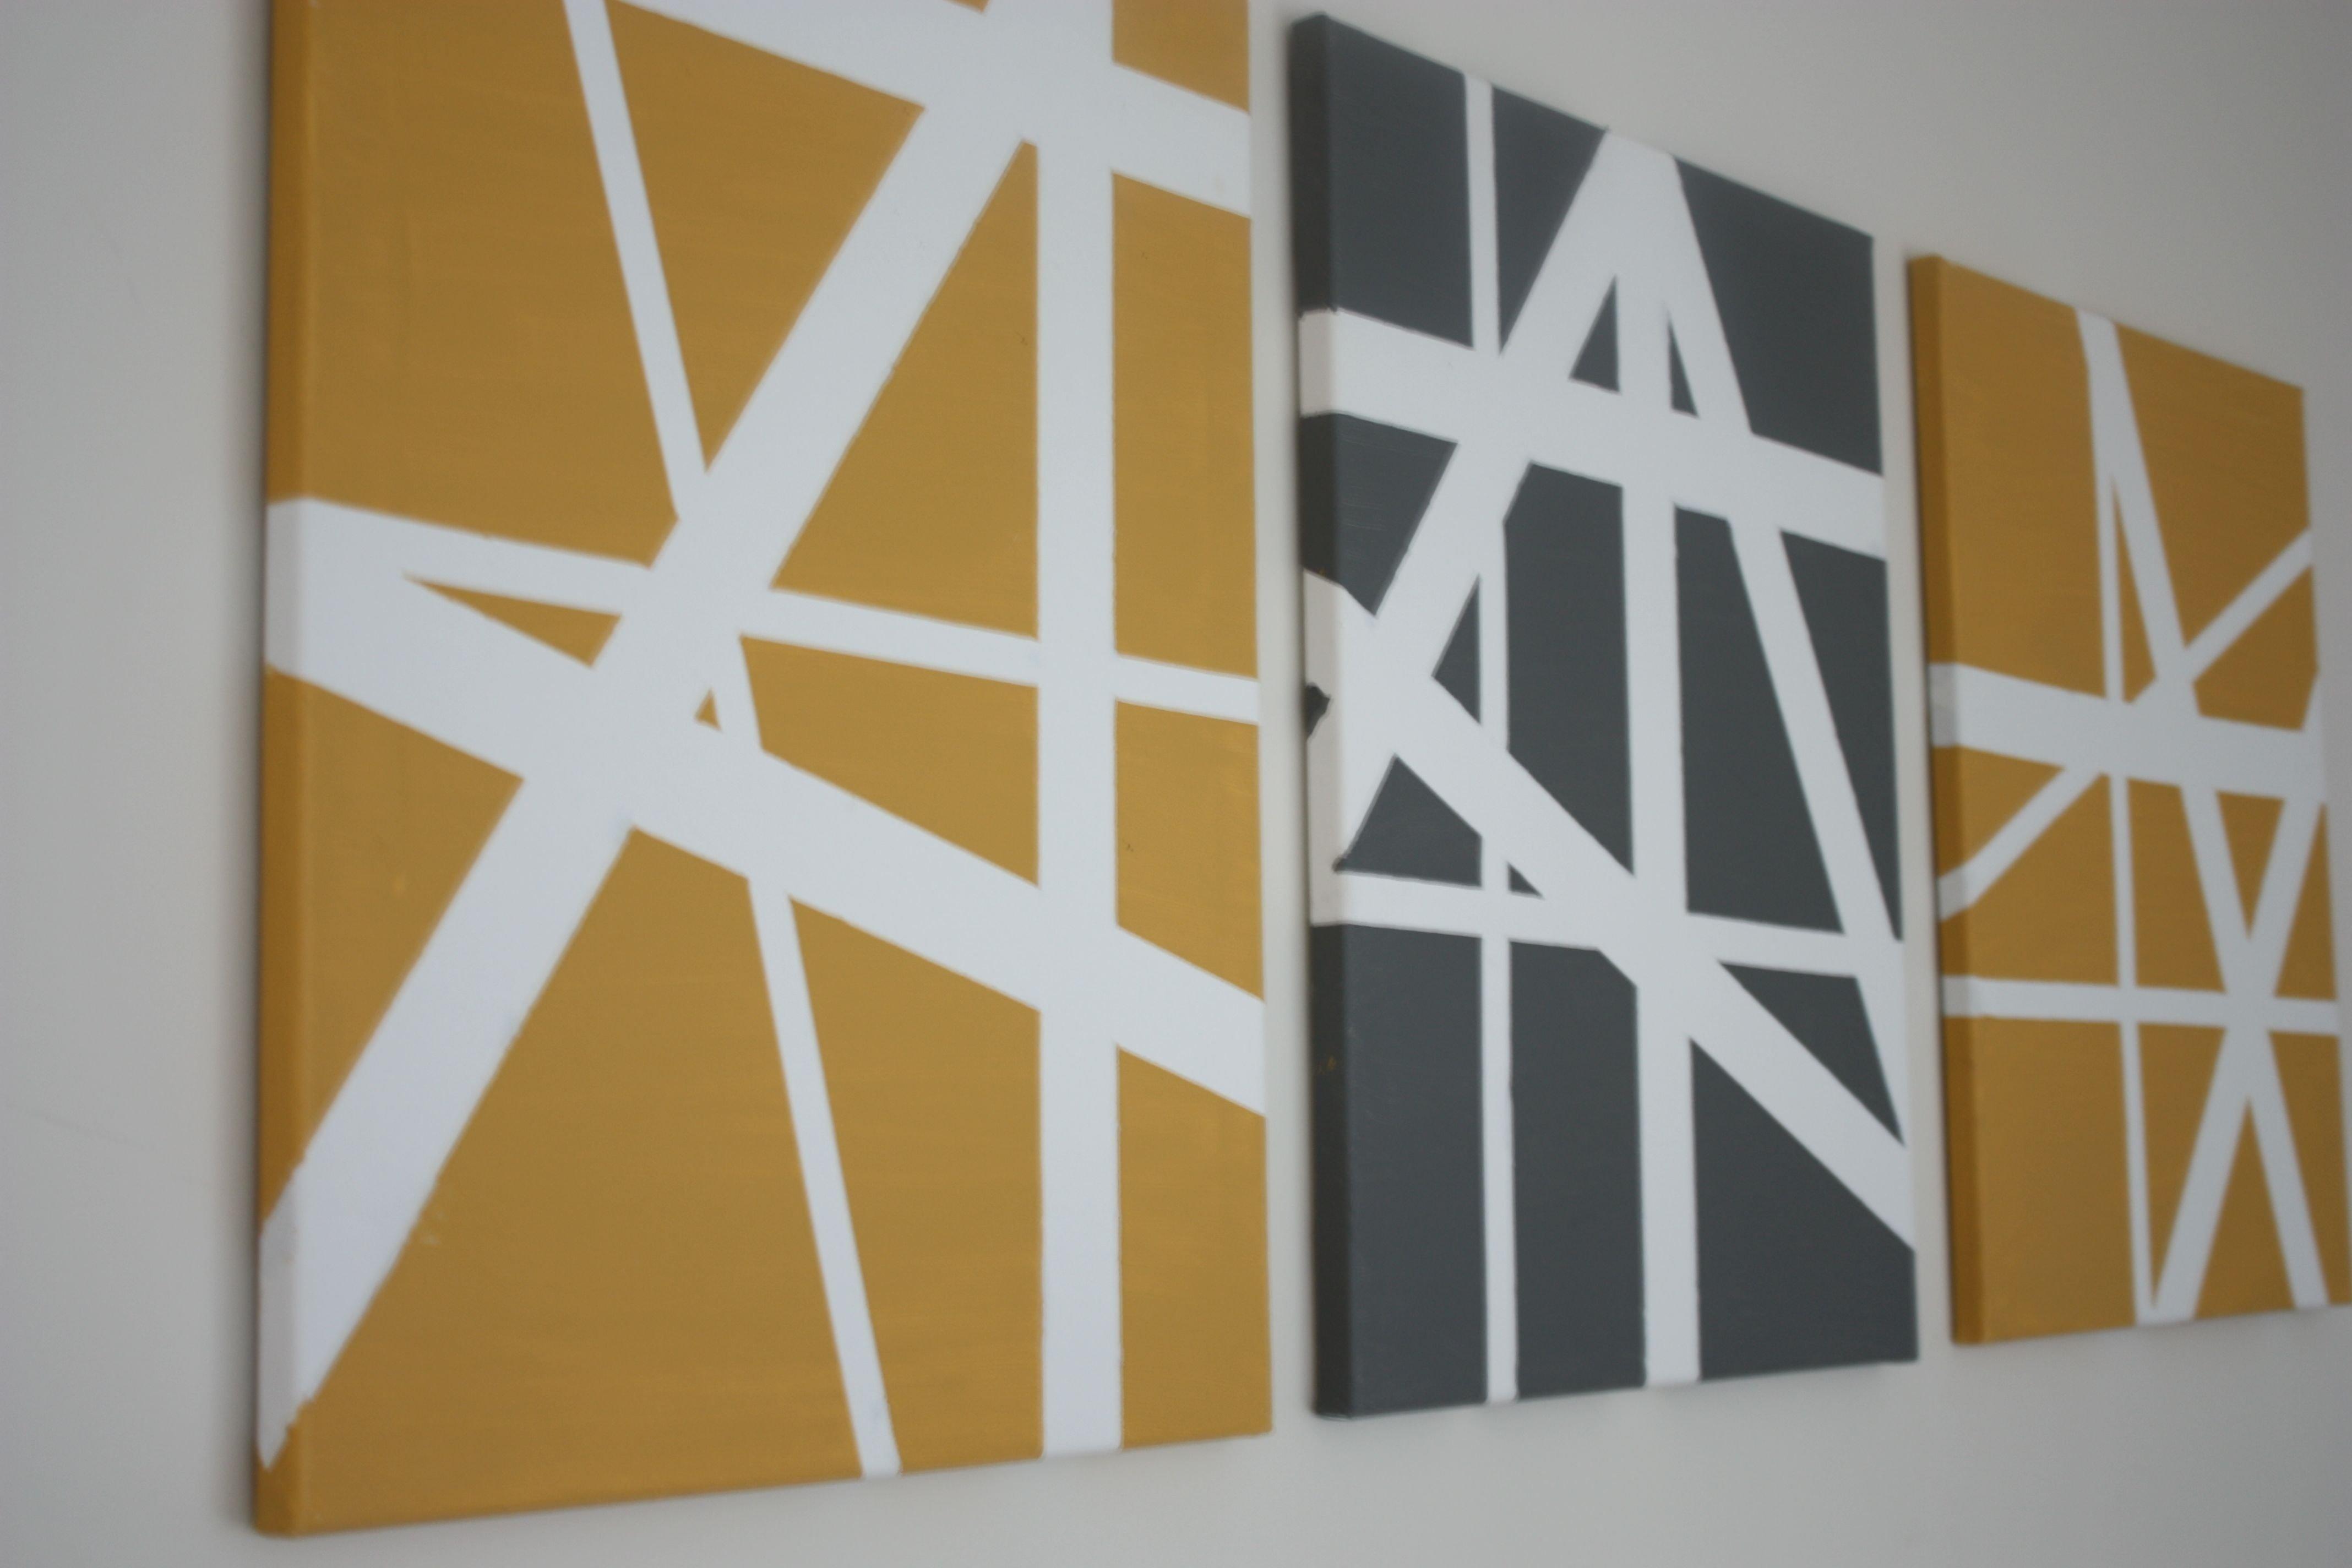 10 Fantastic Diy Canvas Wall Art Ideas diy canvas wall art architecture decorating ideas dma homes quote 2020